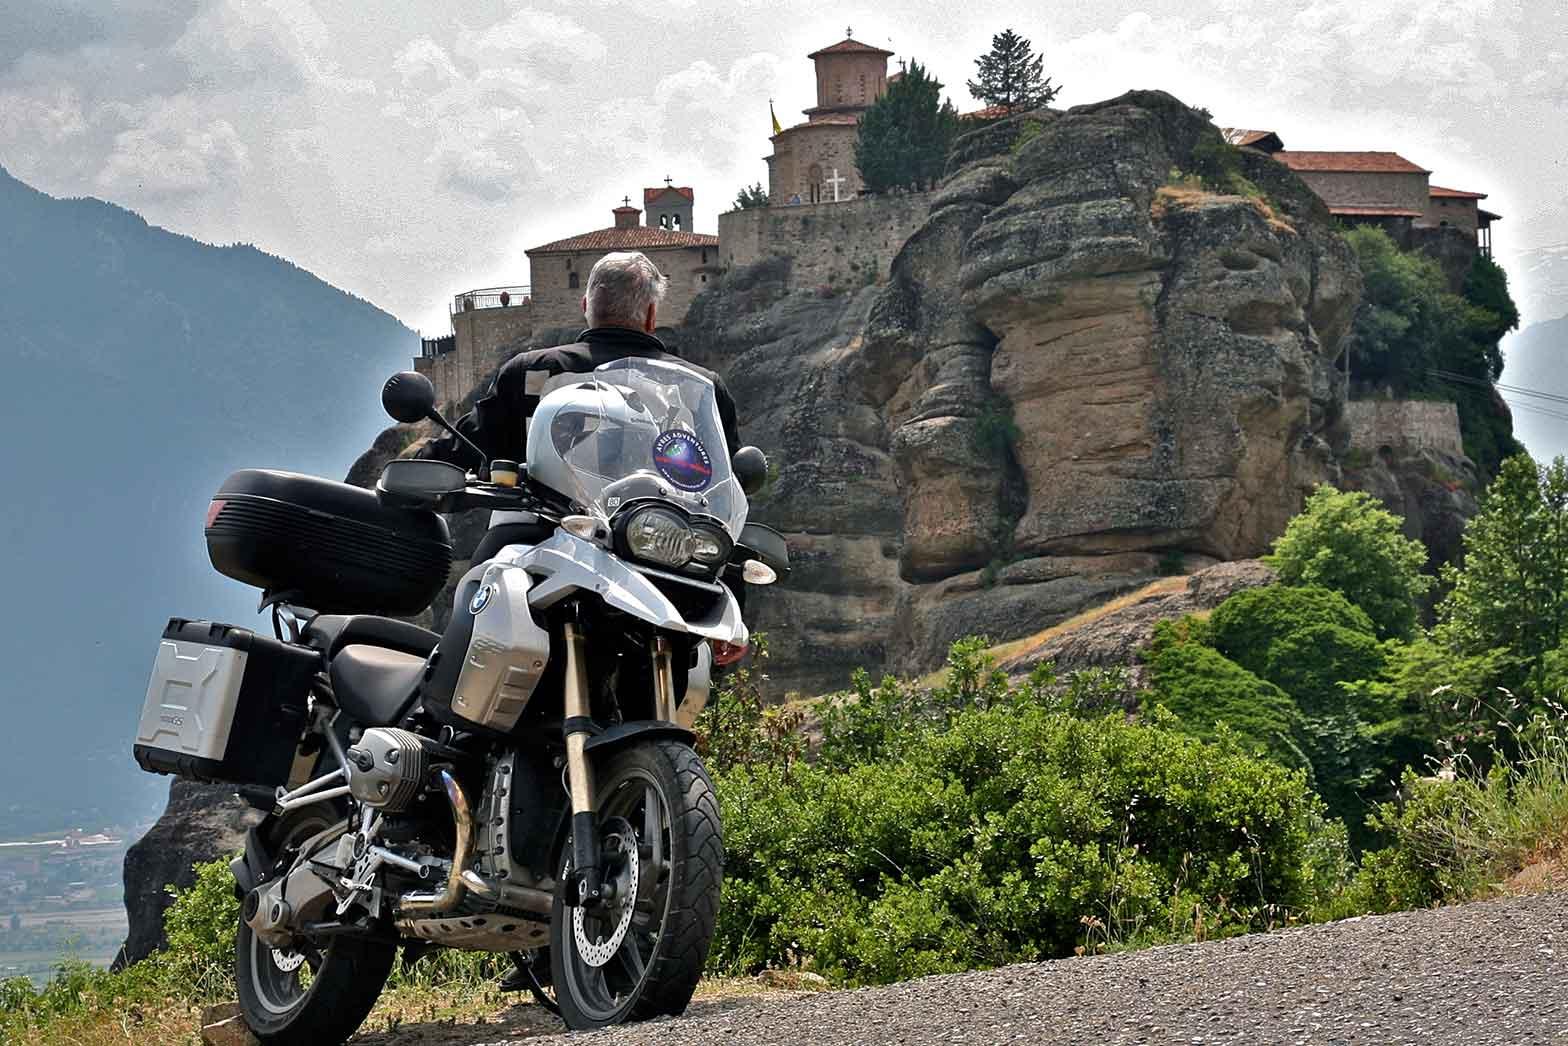 Admiring Meteora monastery